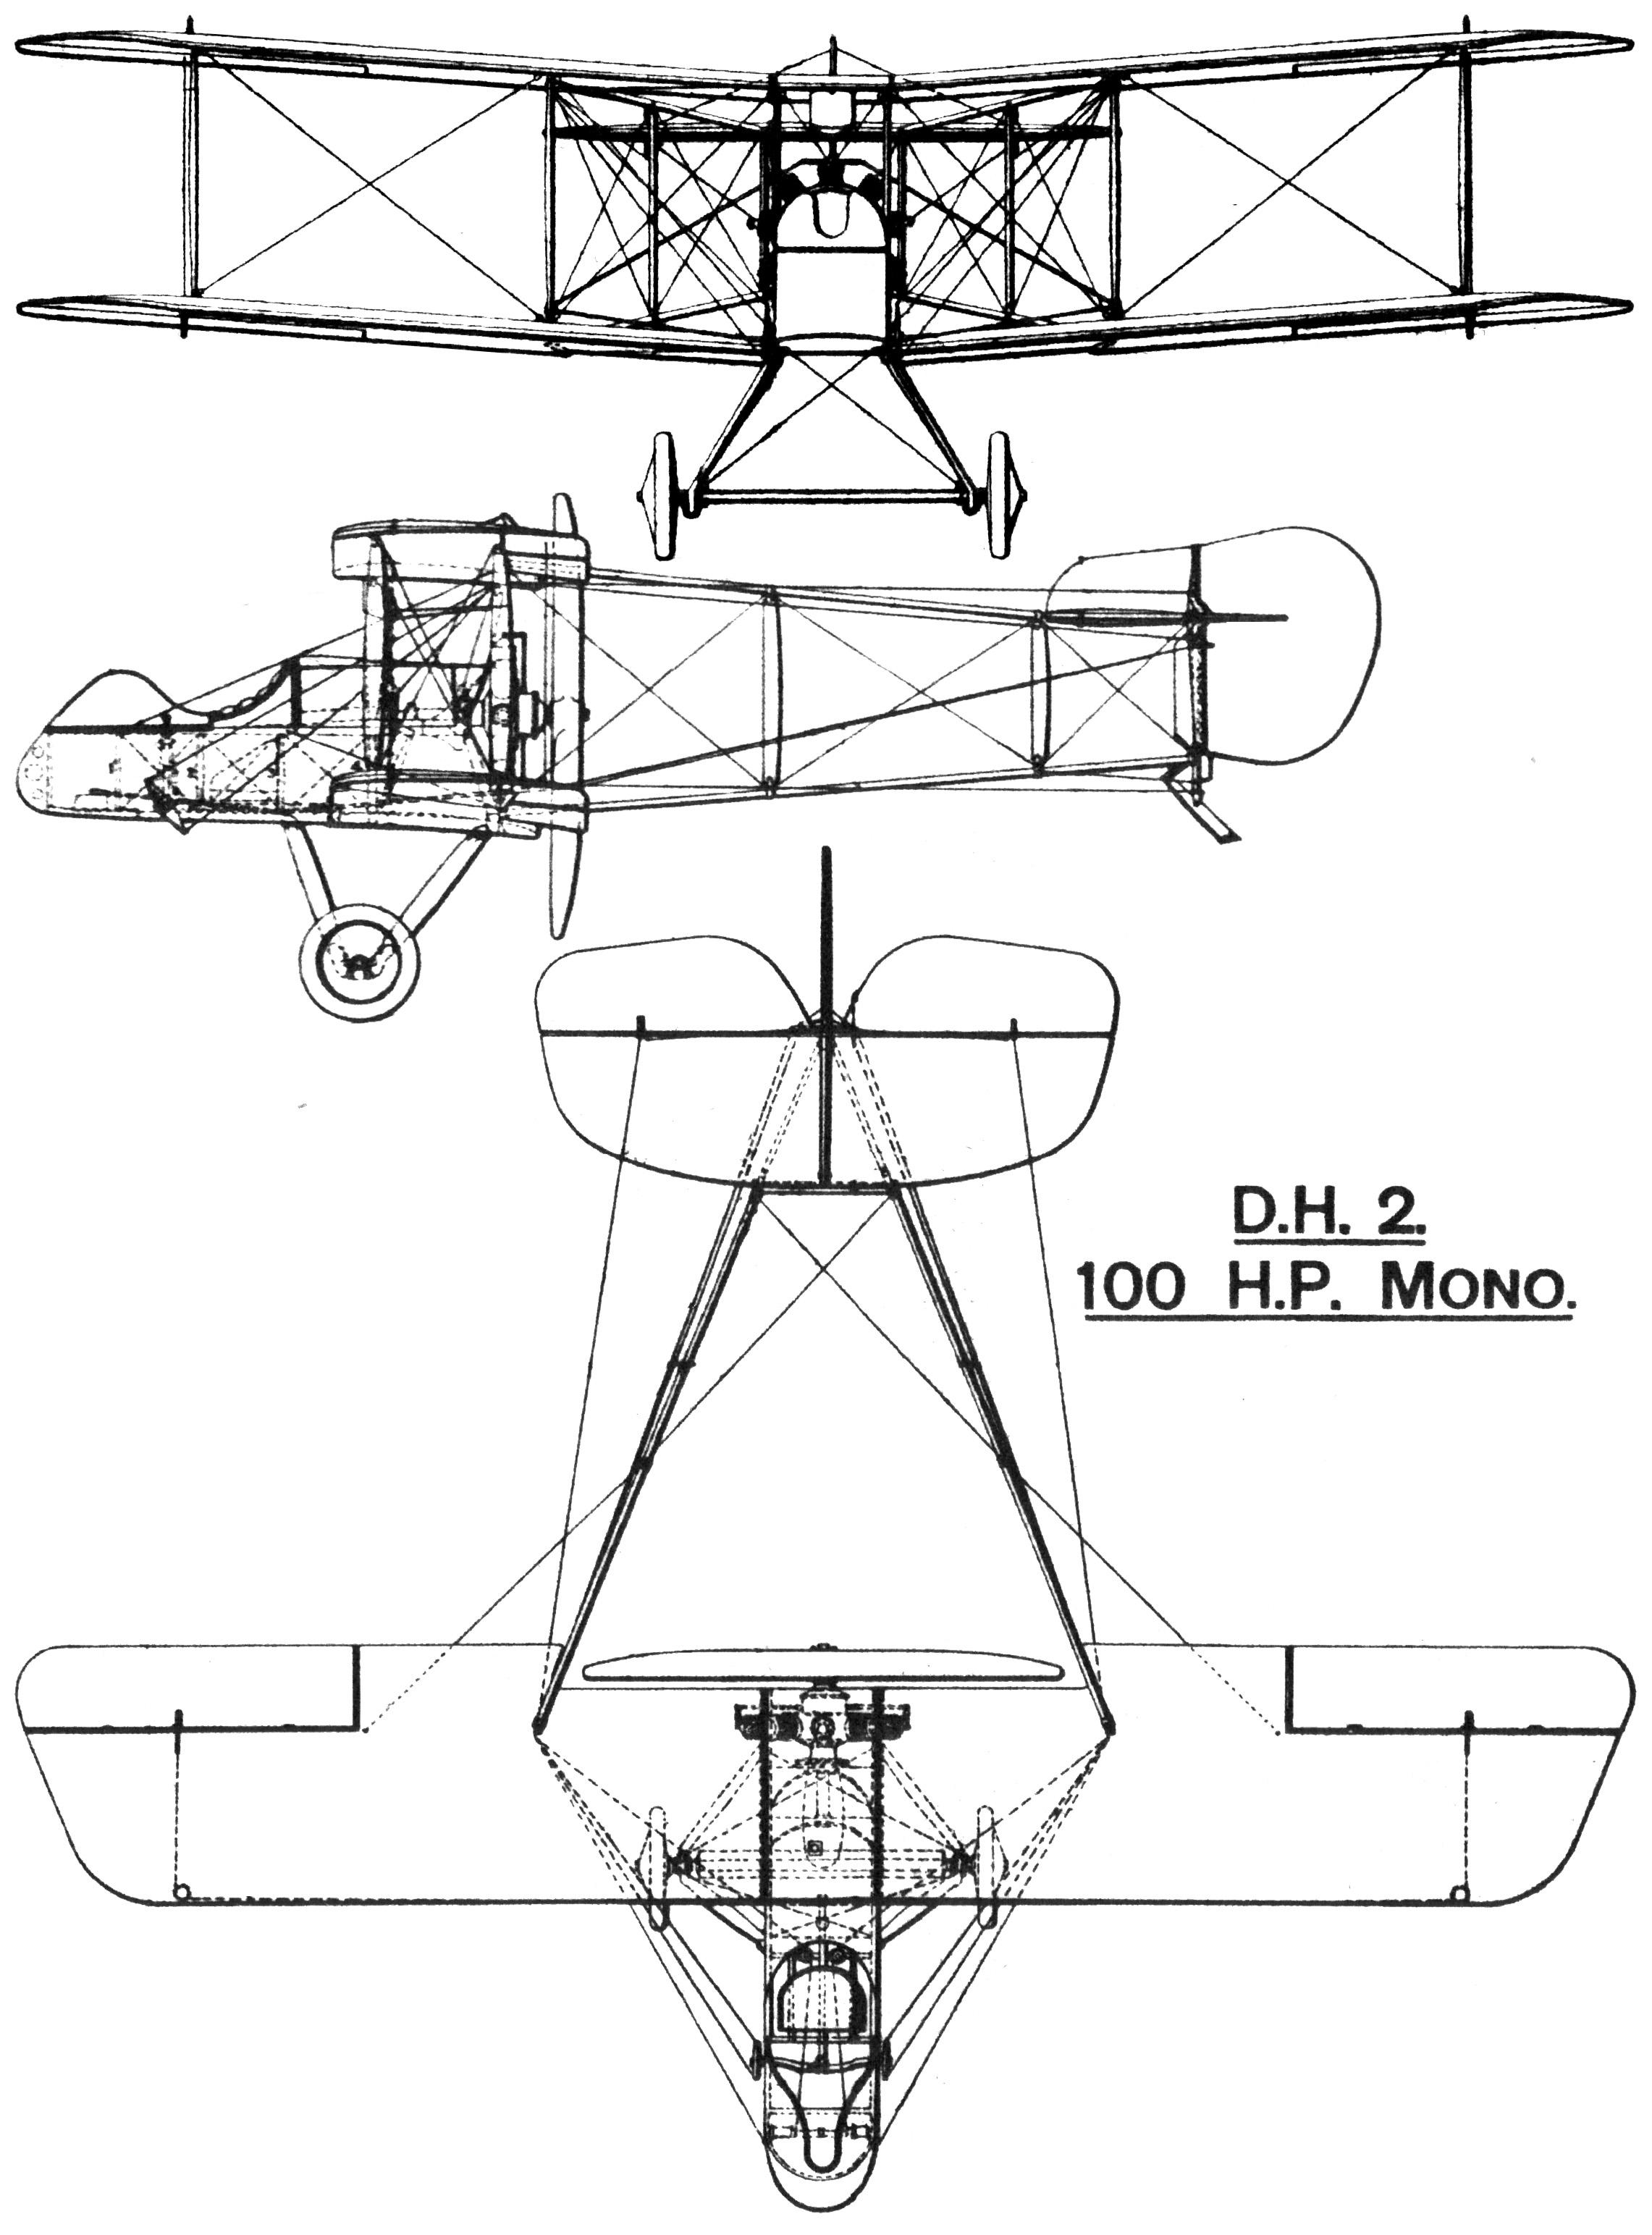 2282x3087 Fileairco D.h.2 British First World War Single Seat Fighter